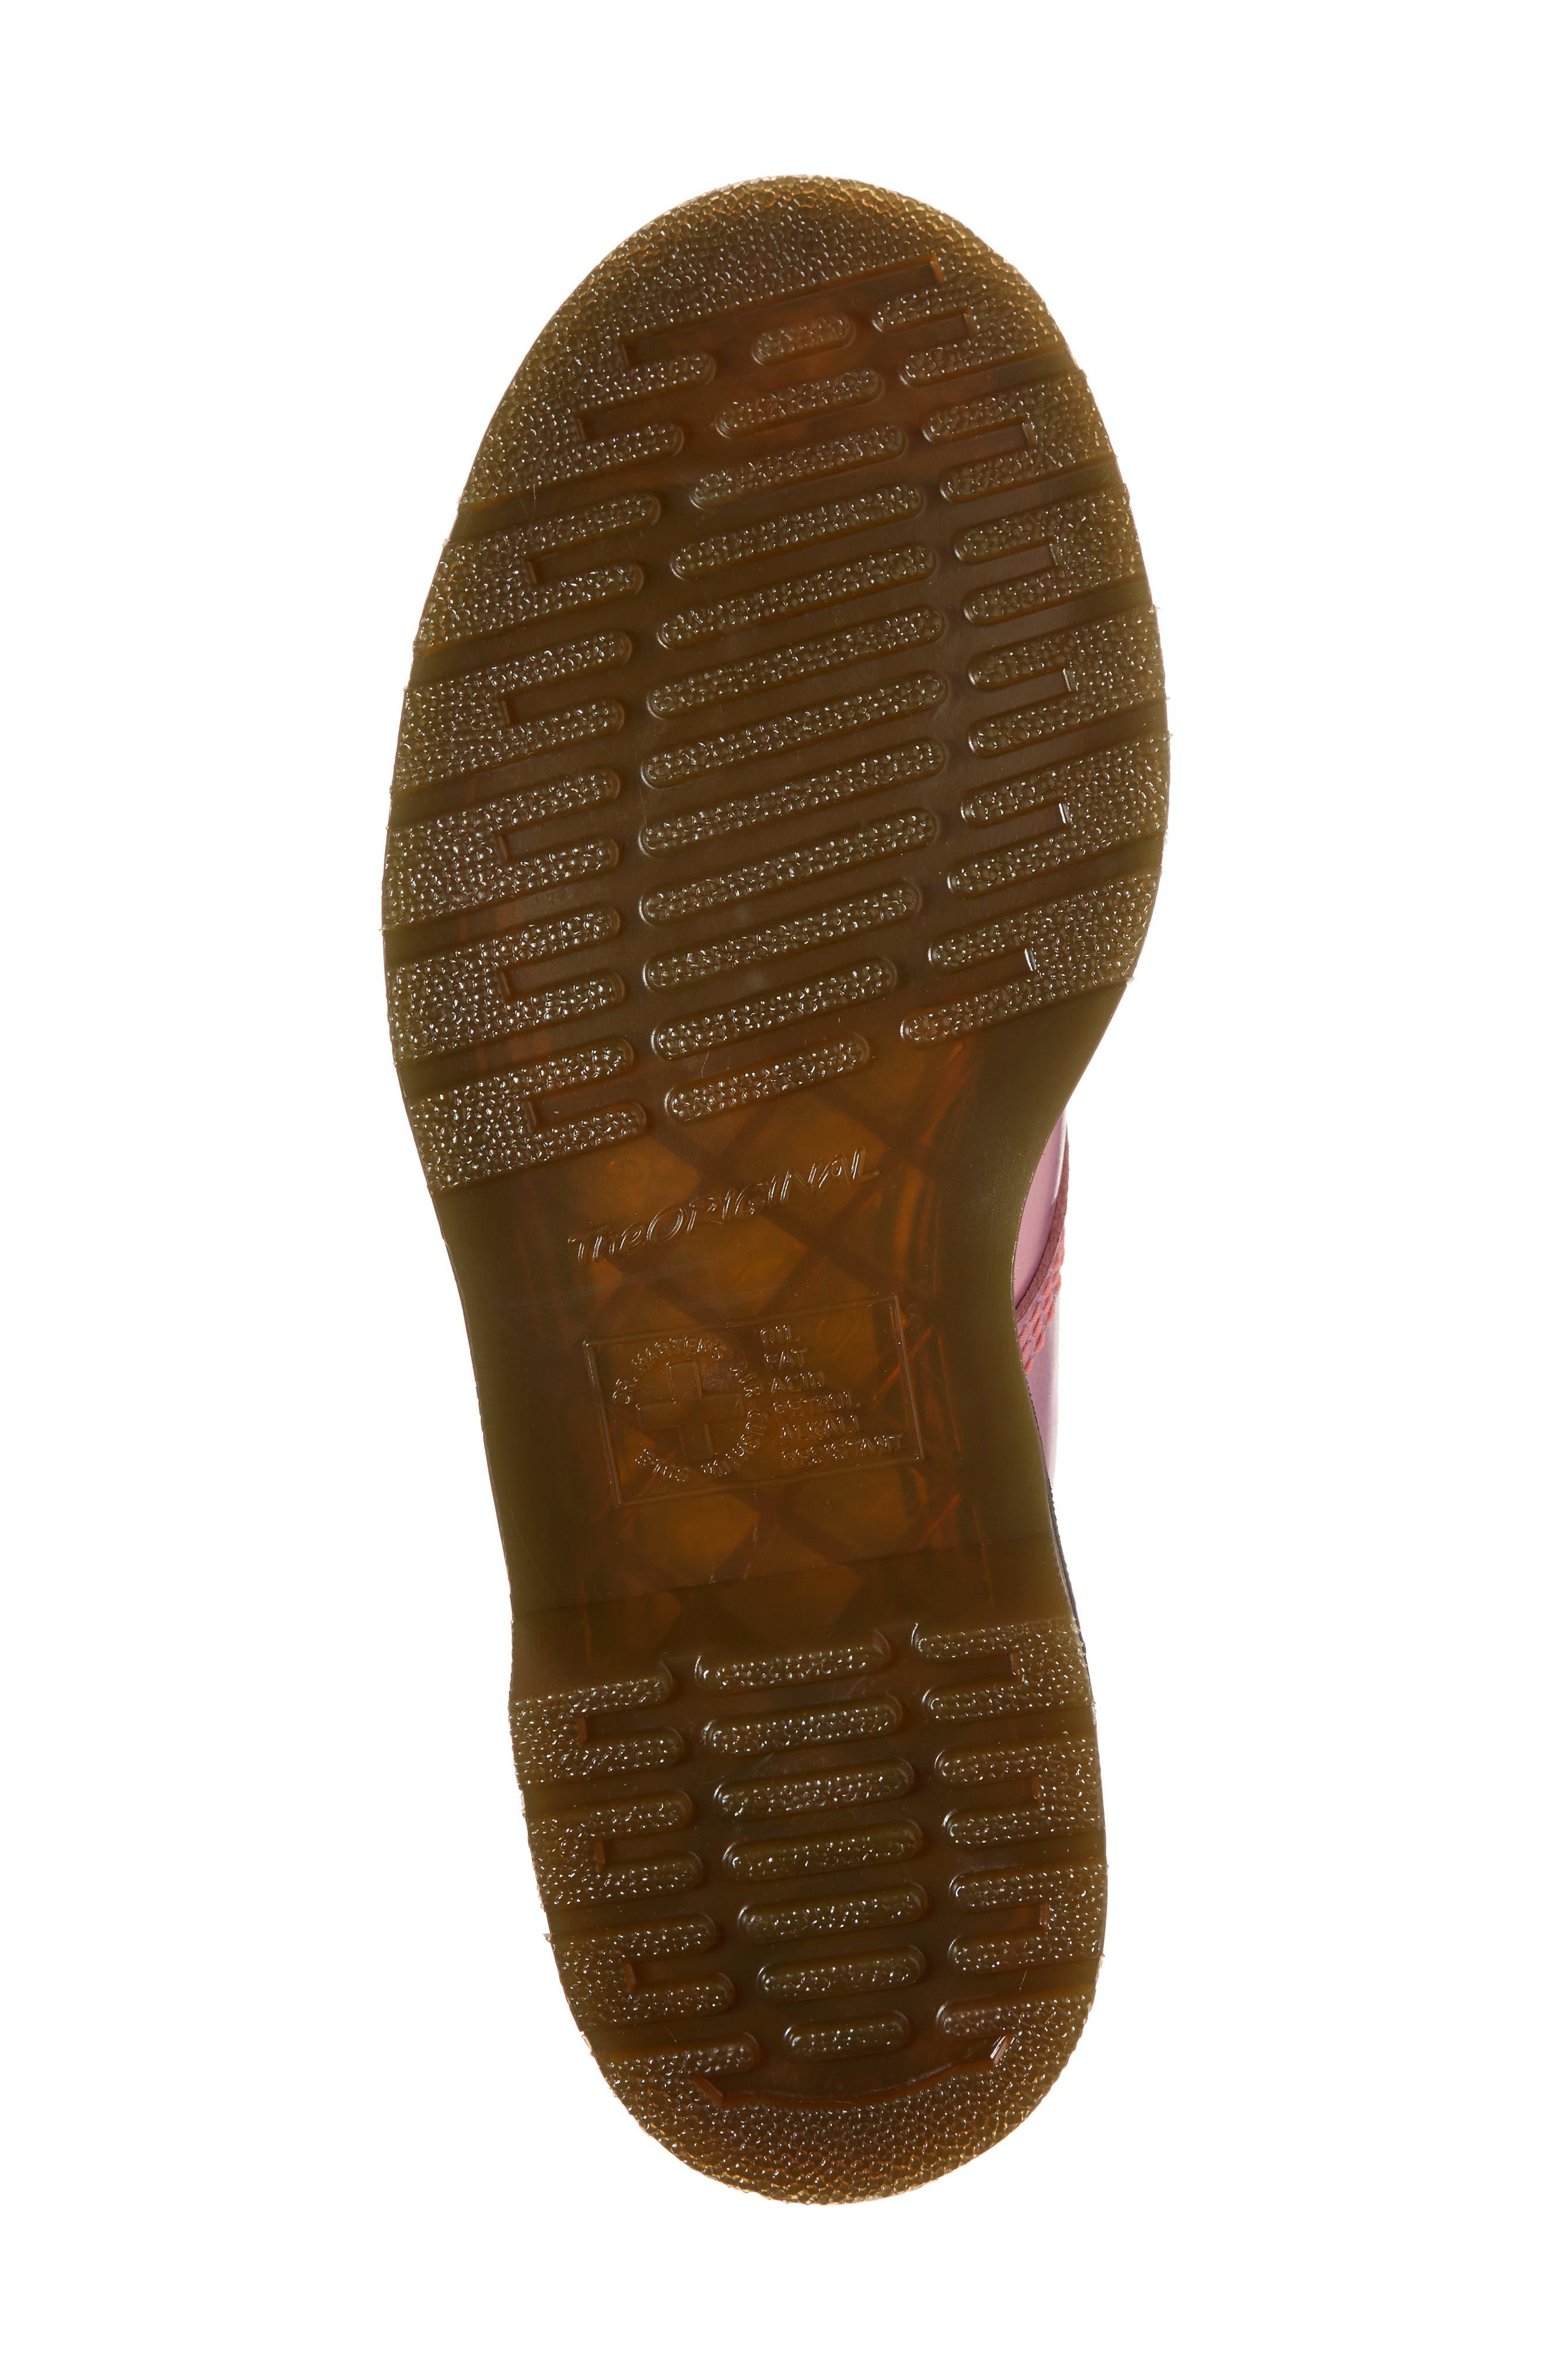 Pascal Metallic Combat Boot,                             Alternate thumbnail 7, color,                             Pink Metallic Leather